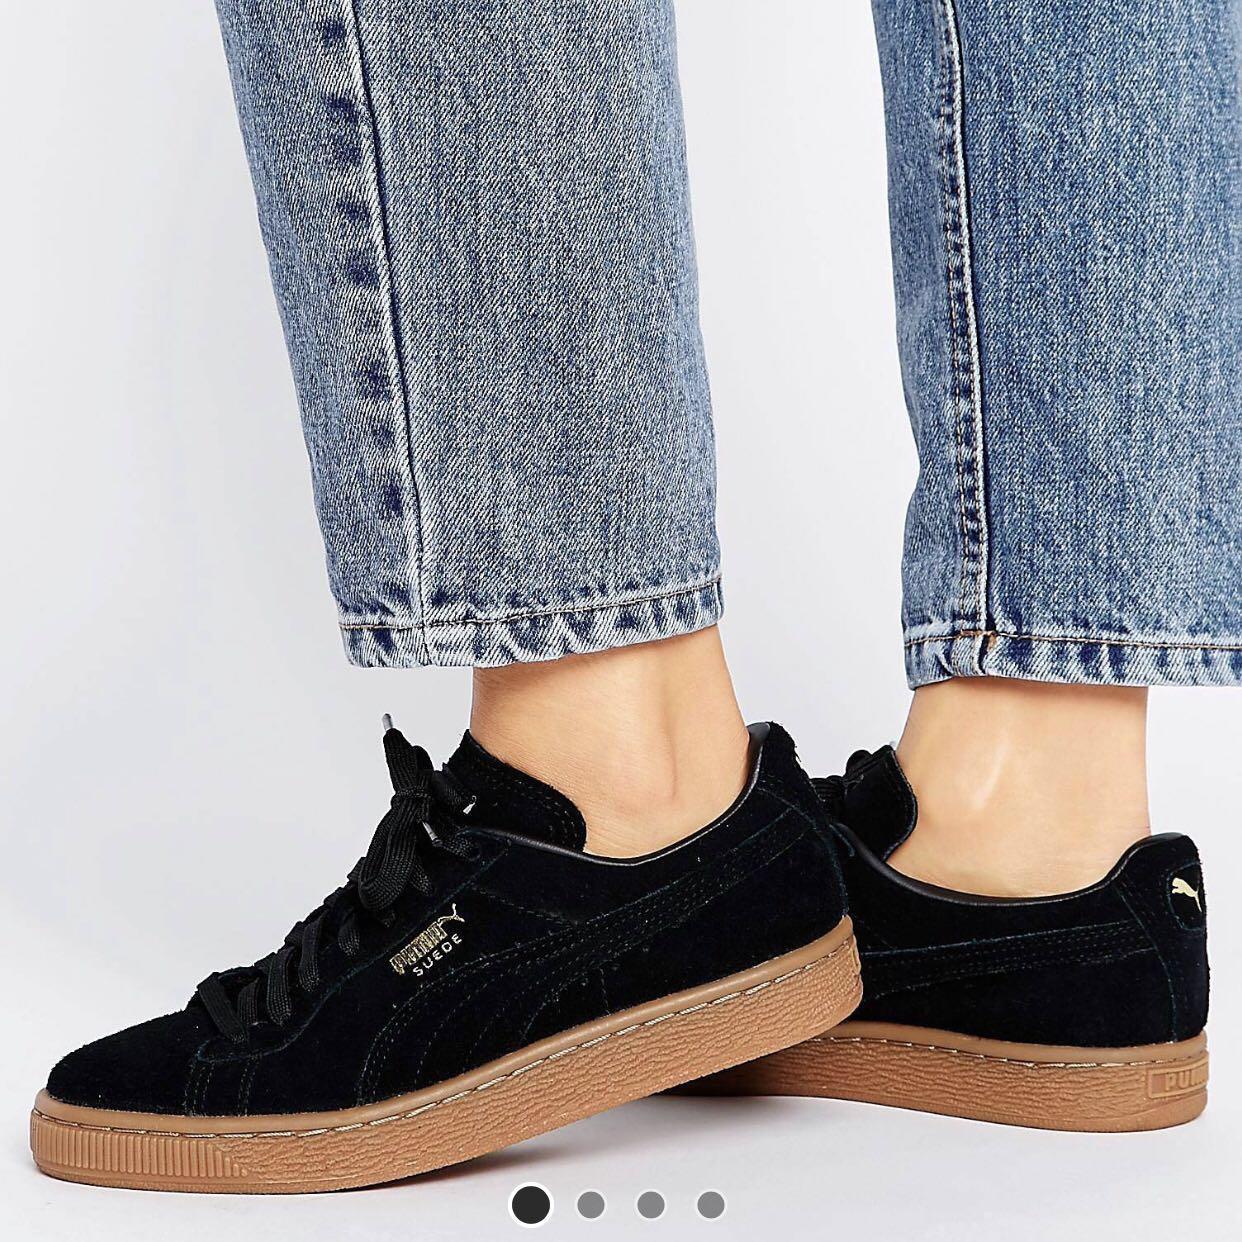 88d071cb0b833 puma black suede classic trainers with gum sole